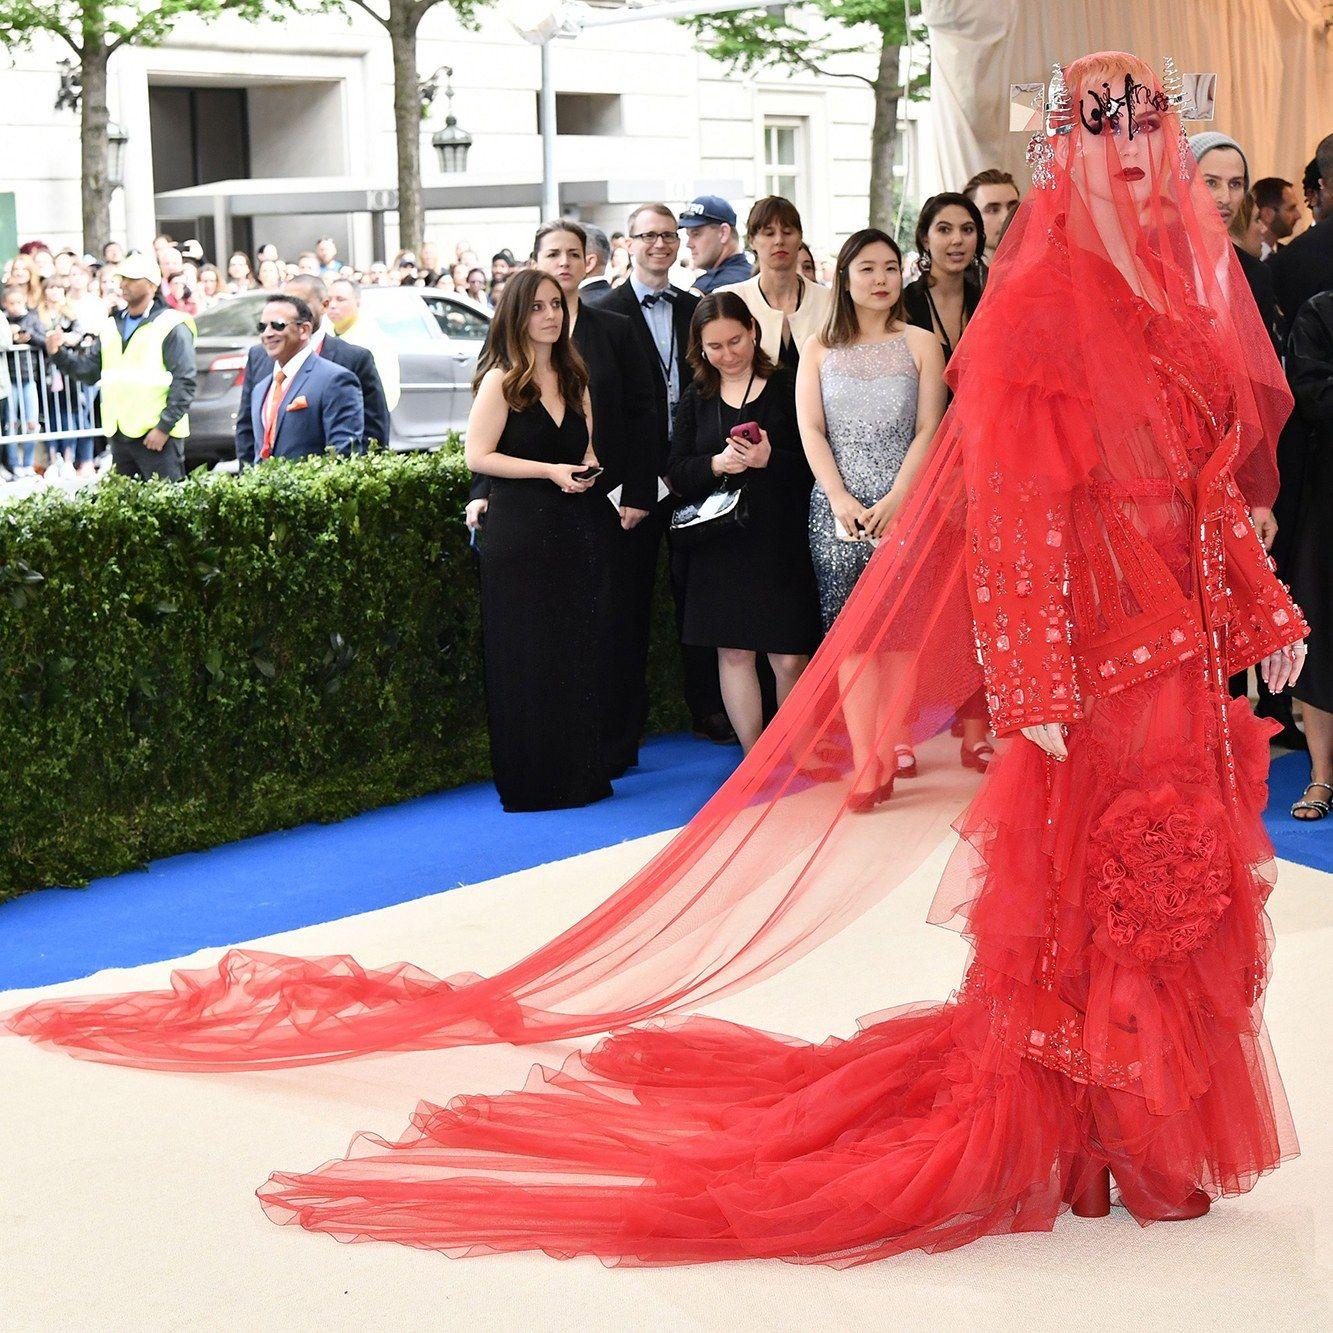 Met Gala 2017 Live Blog: Rihanna Arrives—Plus More ...